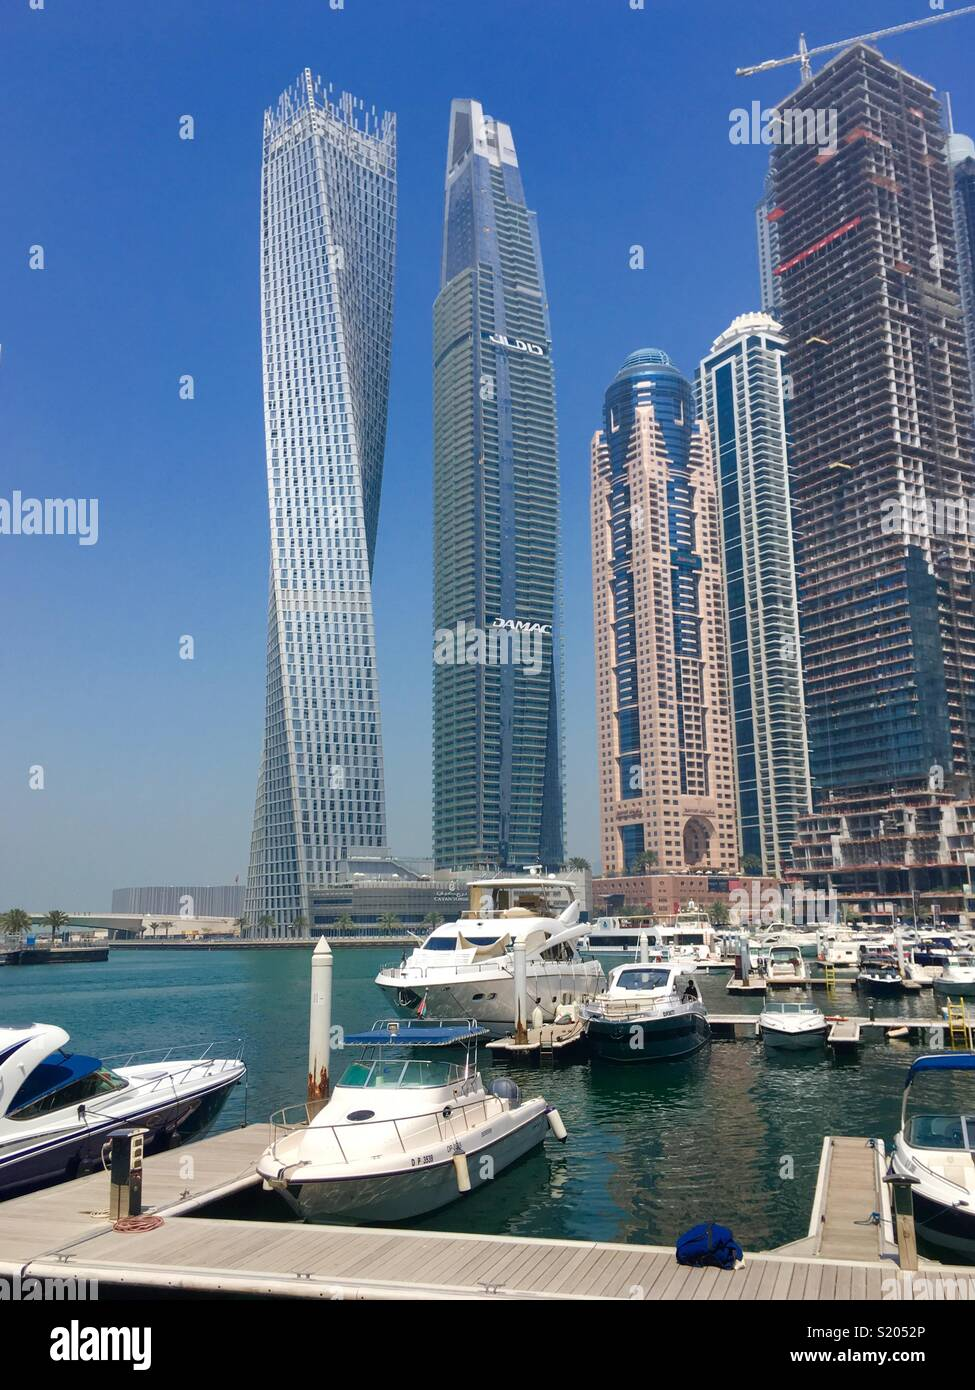 Dubai Marina with Cayan Tower in U.A.E. - Stock Image